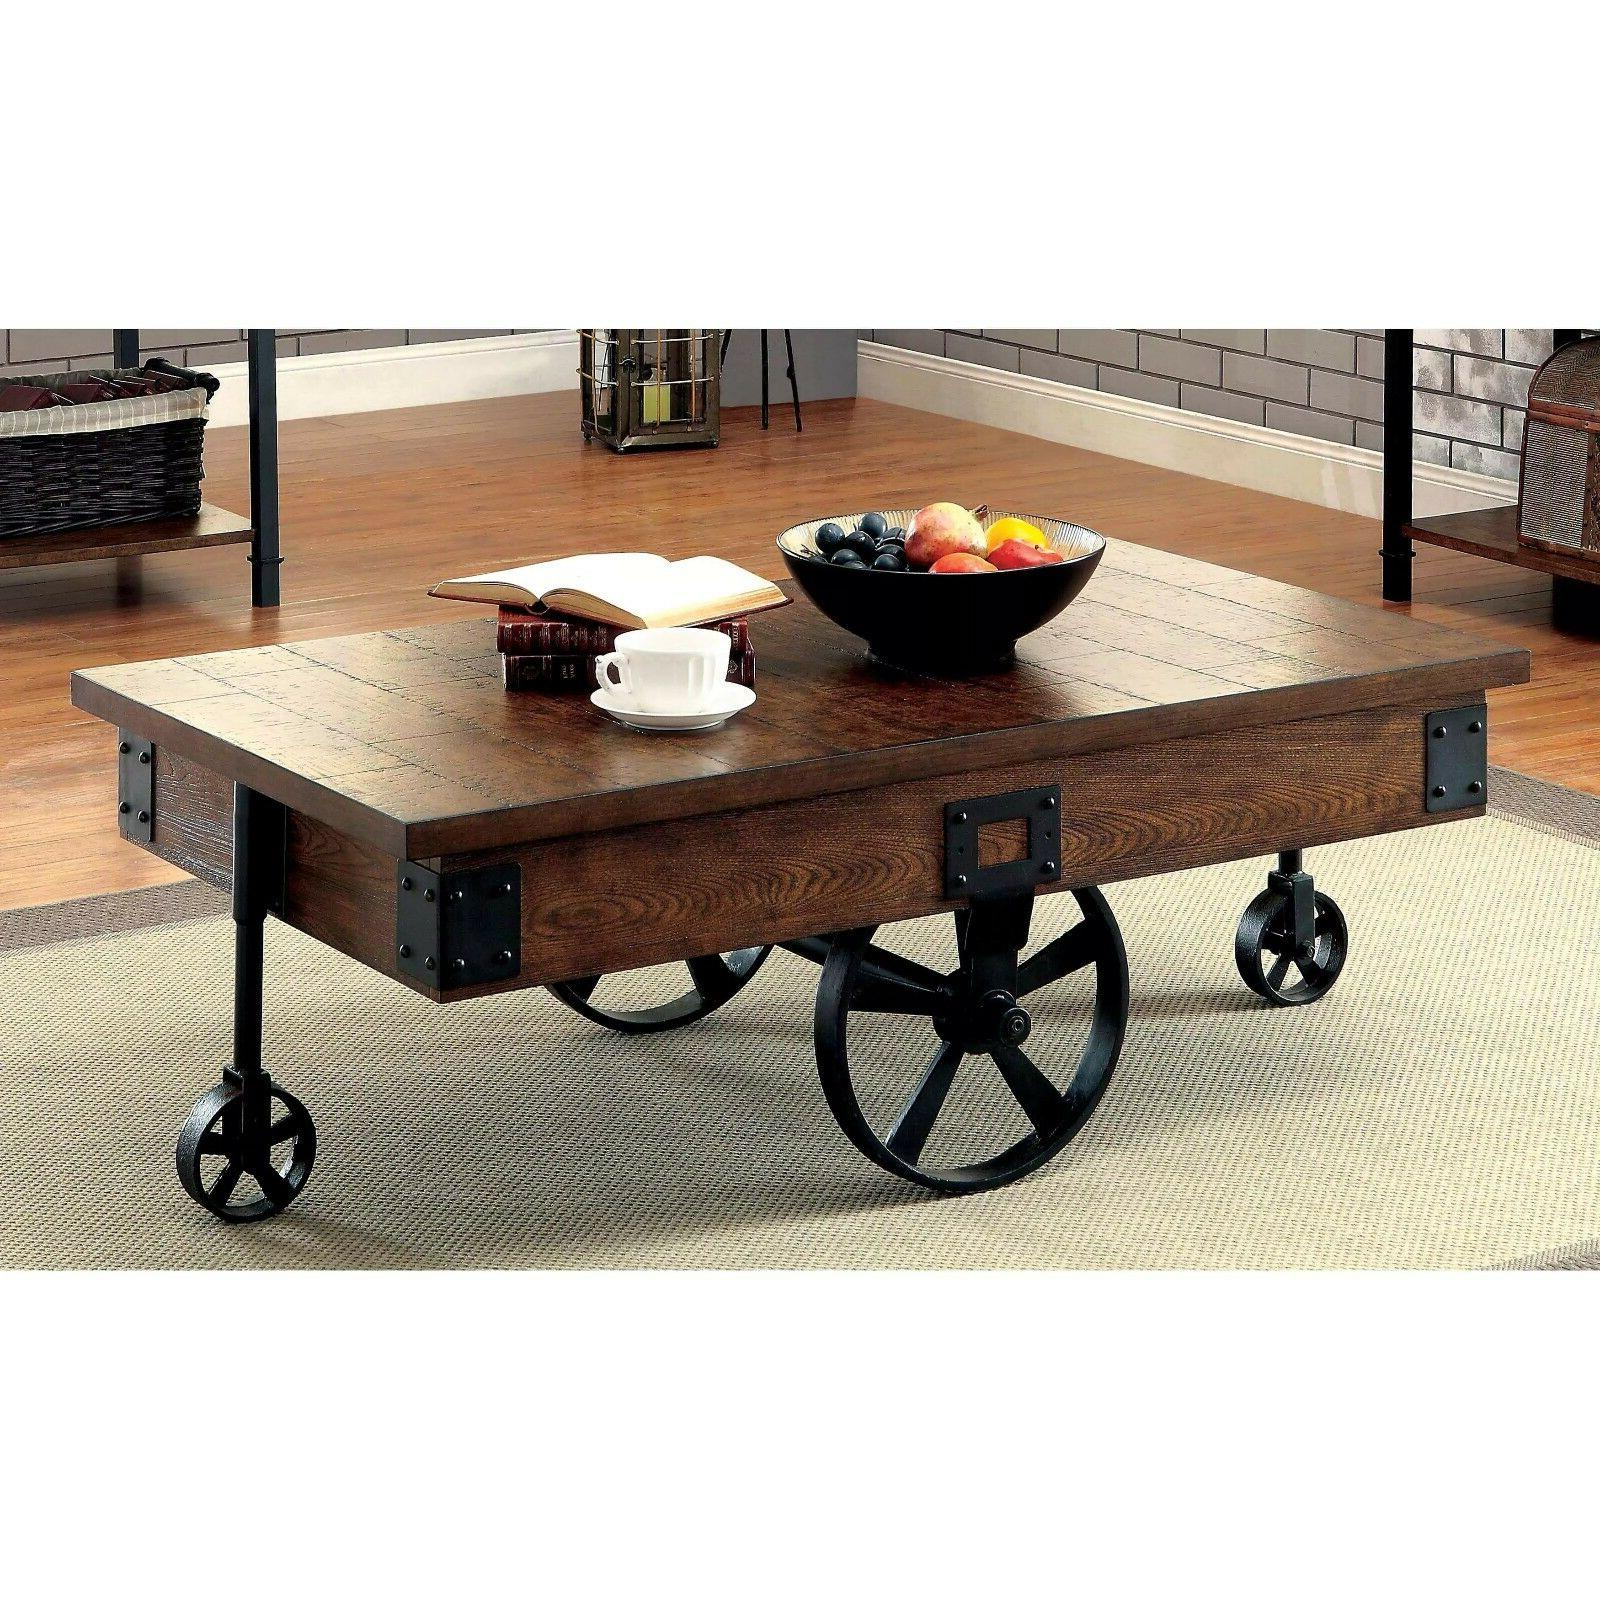 Modern Vintage Industrial Rustic Wood 50 Inch Coffee Table I